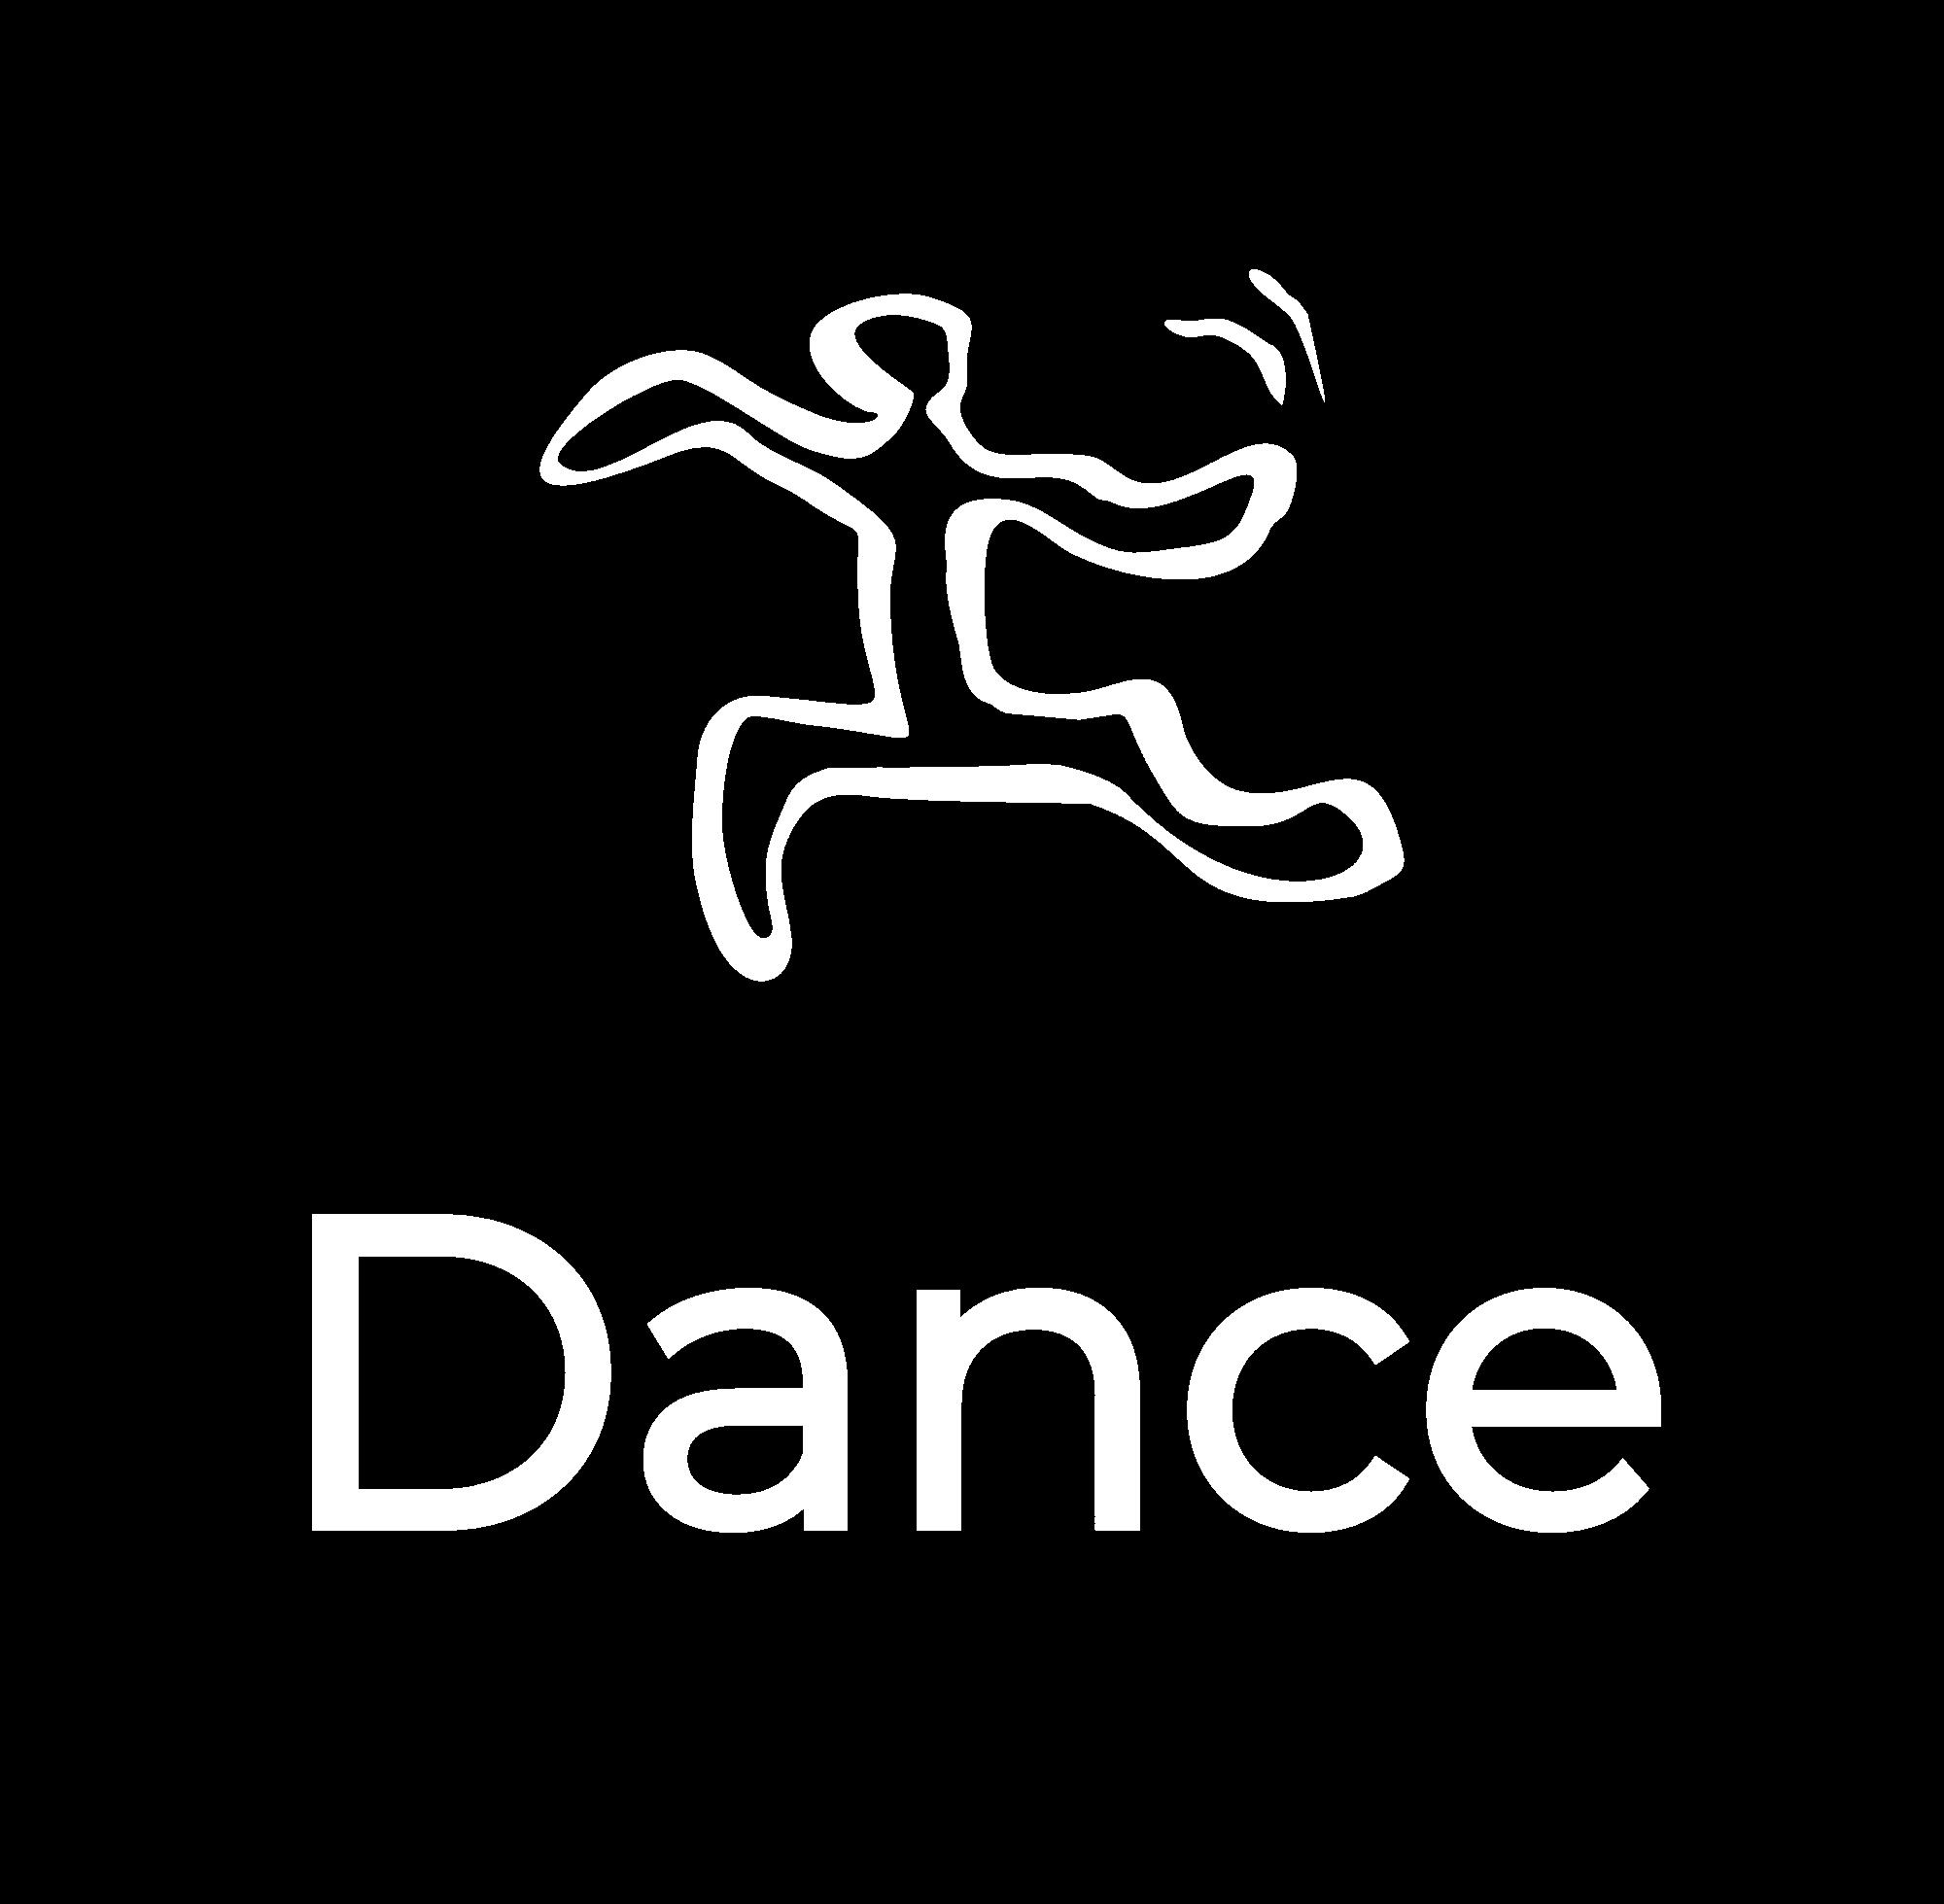 Dance-logo-white.png